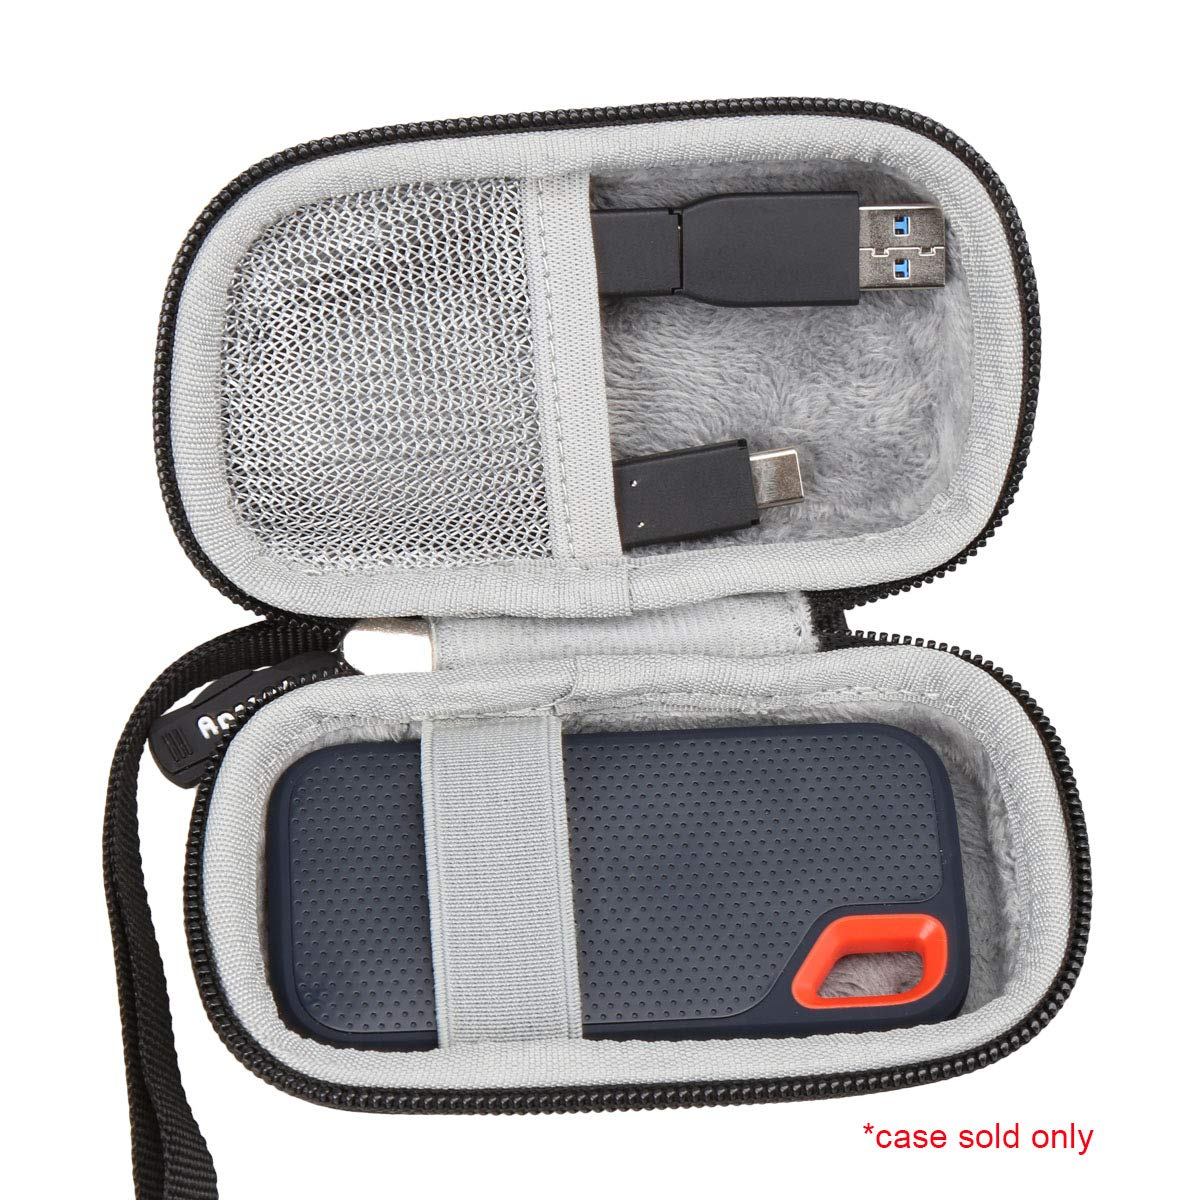 Aproca Duro Viajes Funda Bolso Caso para SanDisk Extreme Portable ...